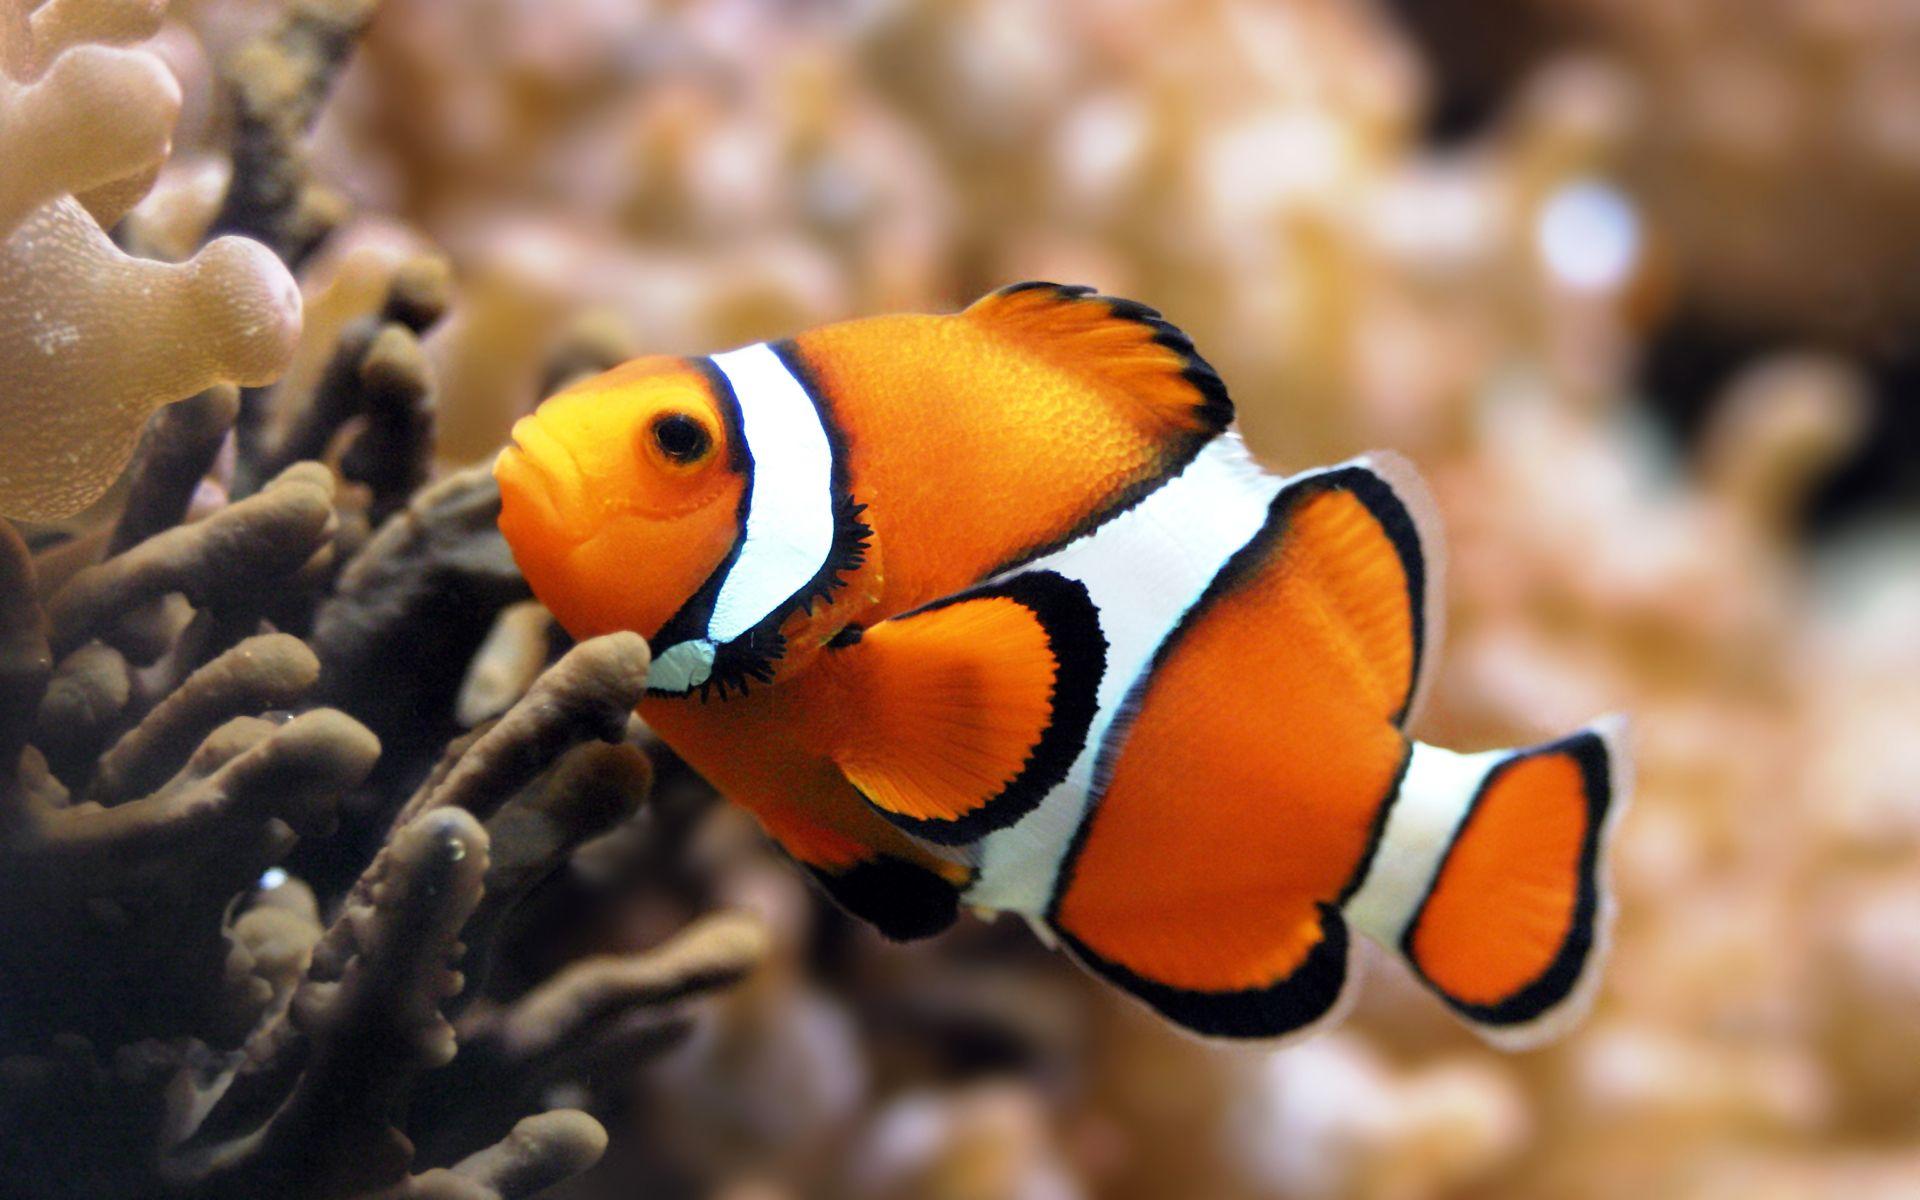 Fish HD Wallpaper by Infoway LLC - Website Development Company ...